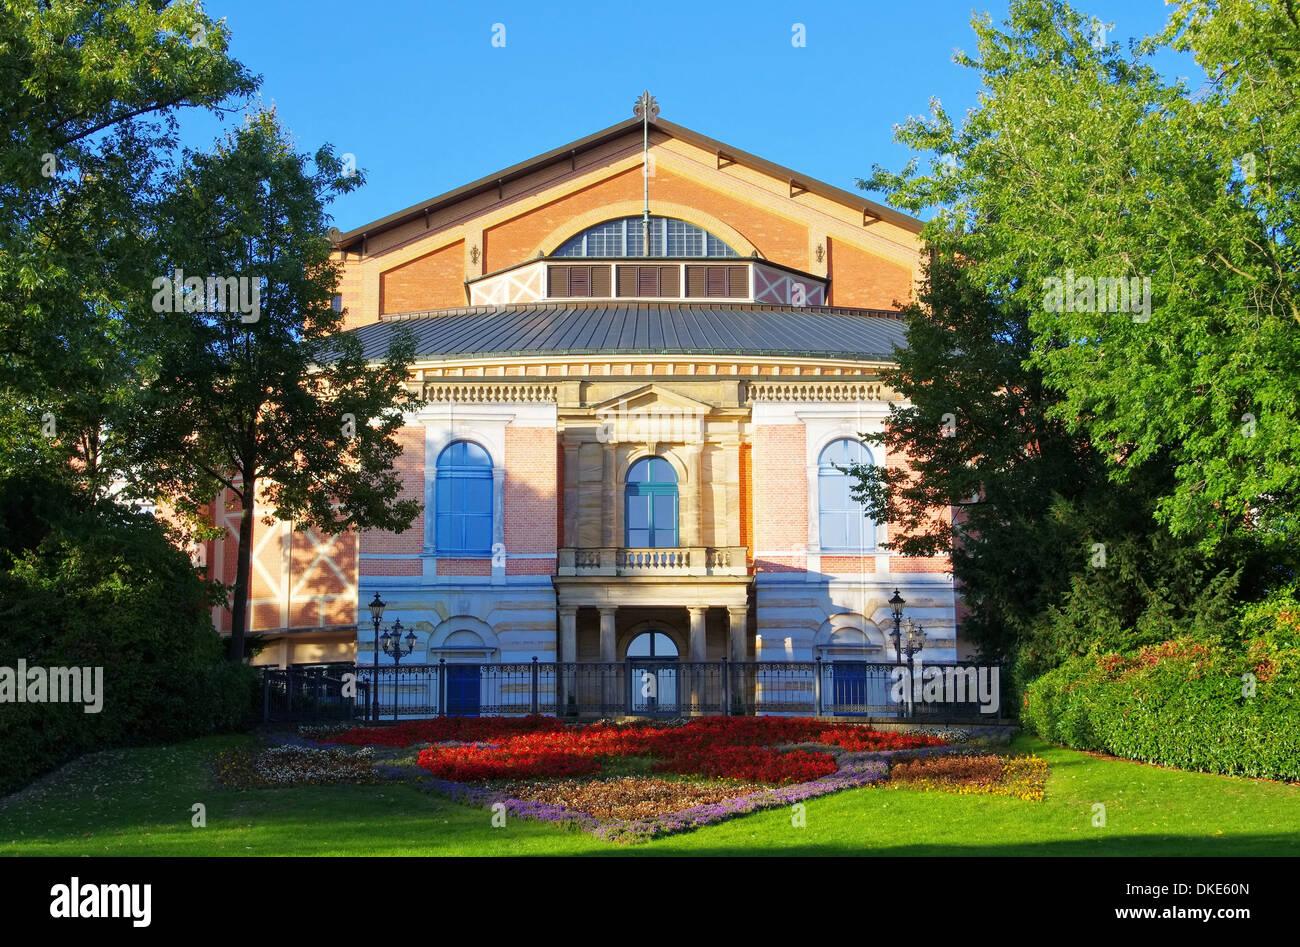 Bayreuth Festspielhaus - Bayreuth Festival Theatre 03 - Stock Image